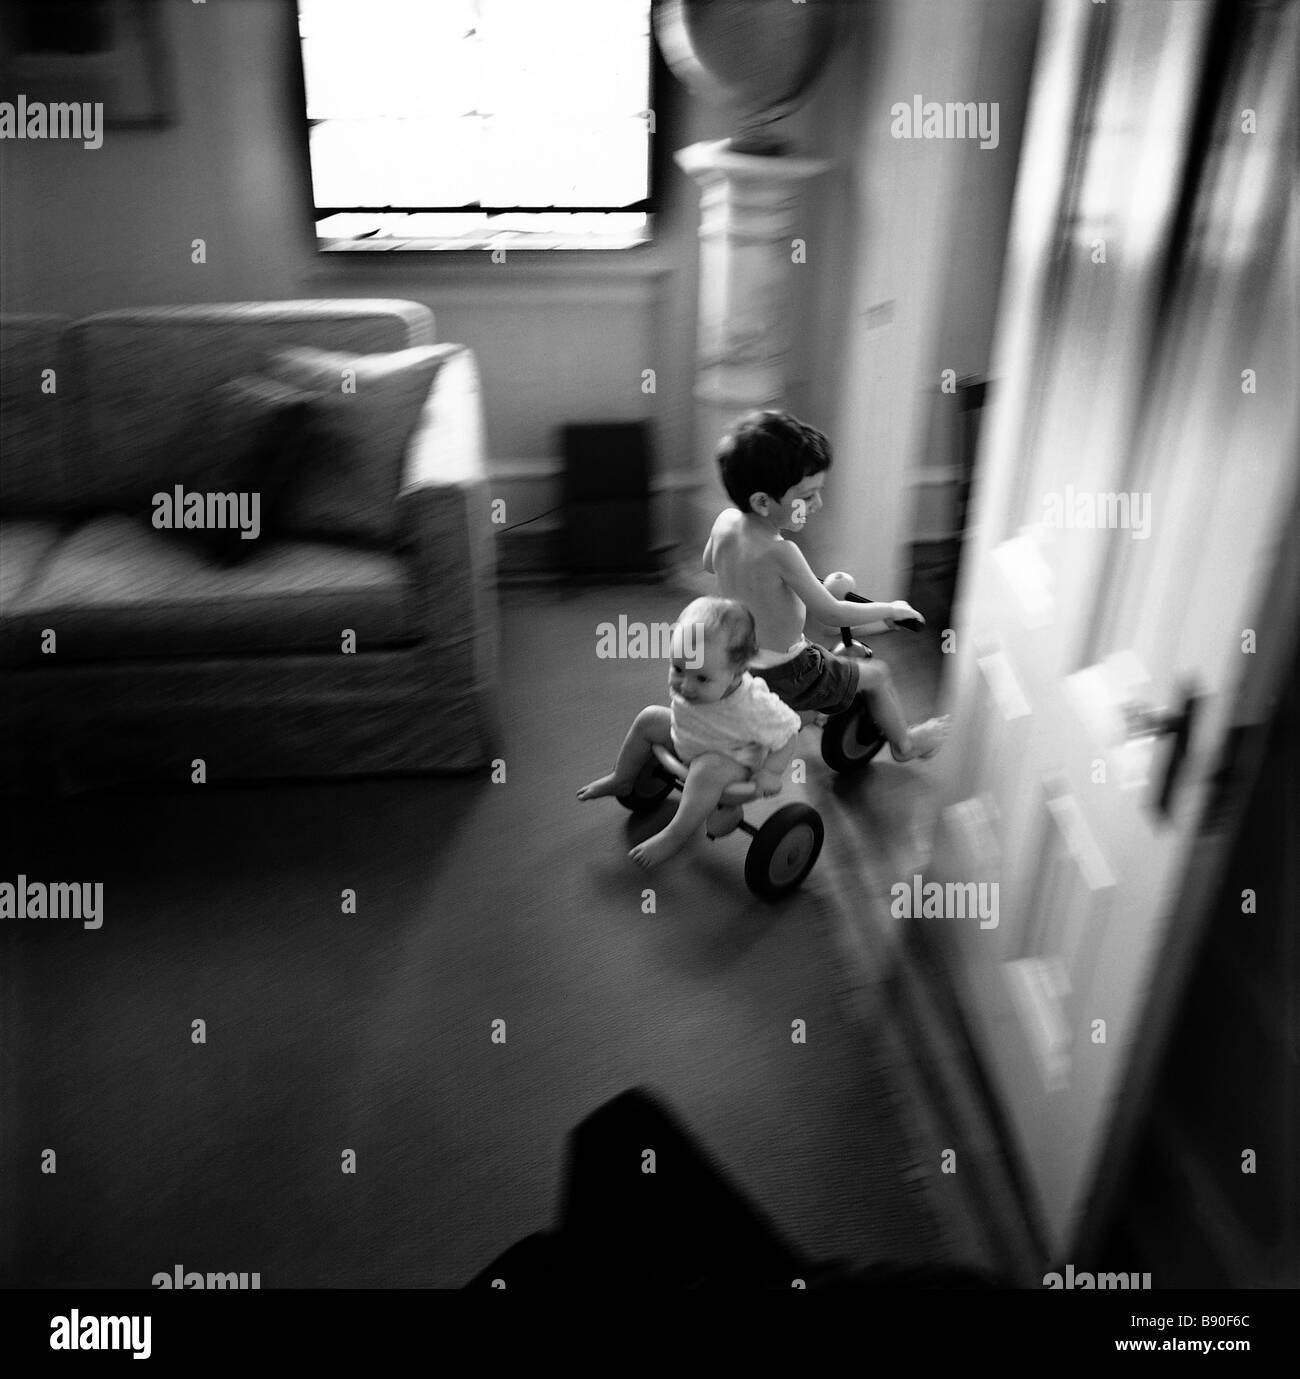 FL2671, NICK KELSH; Kinder Dreirad fahren durch Haus Stockbild